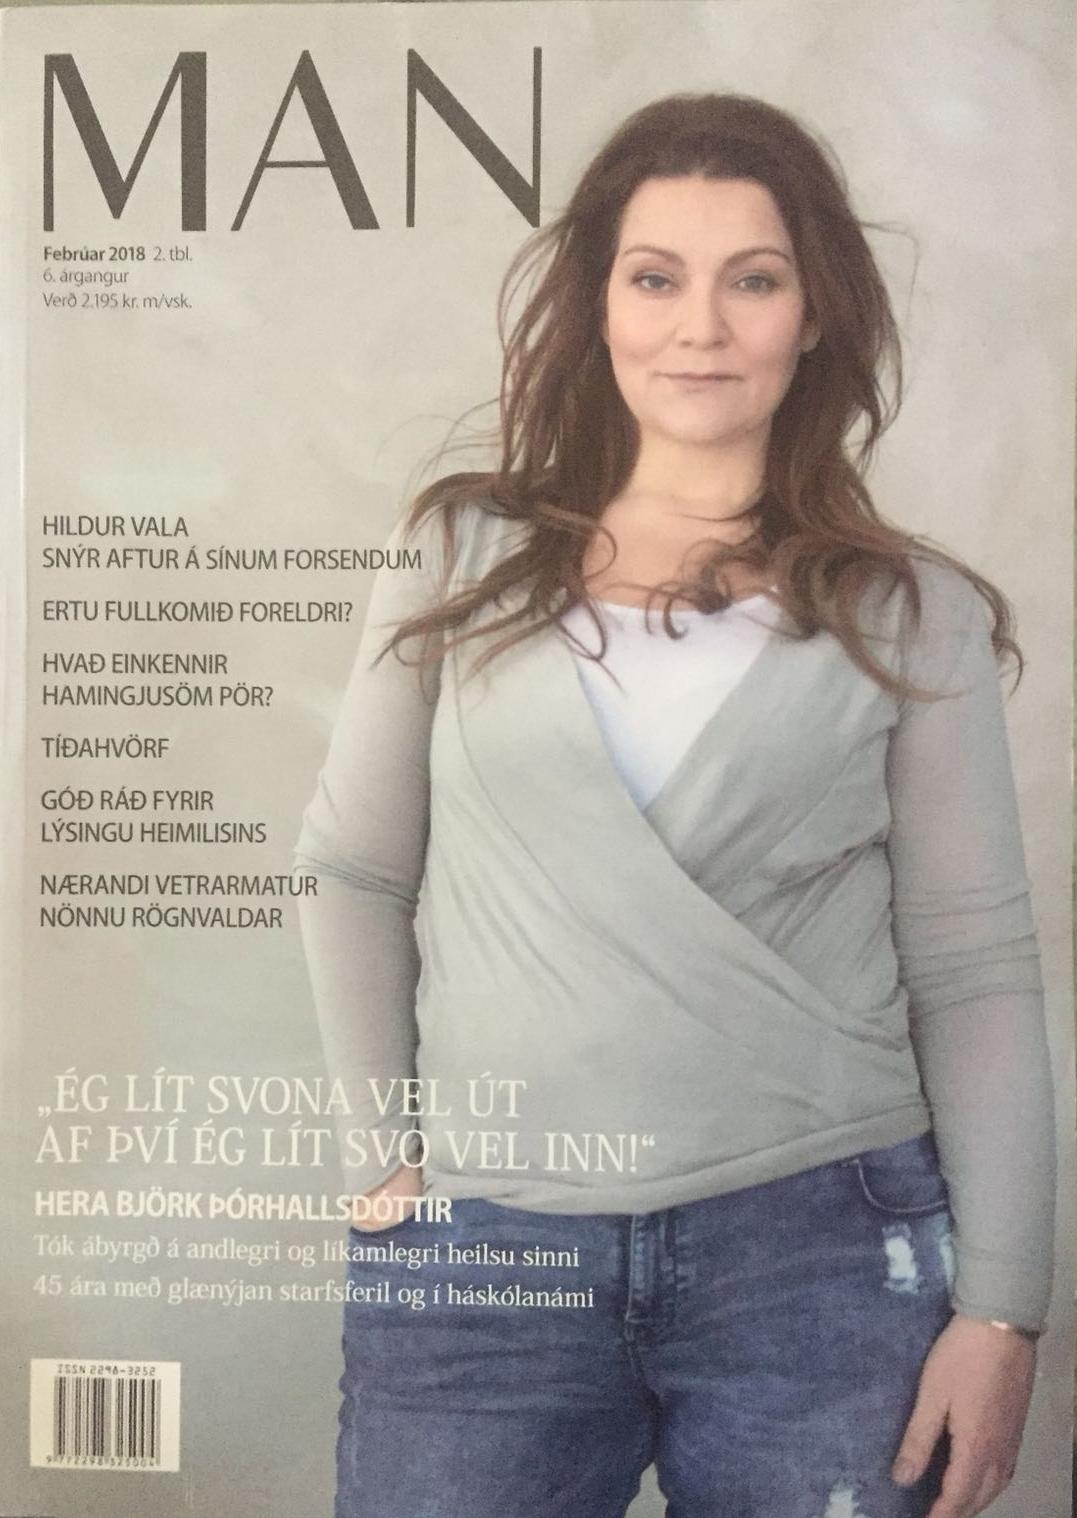 MAN Magazine